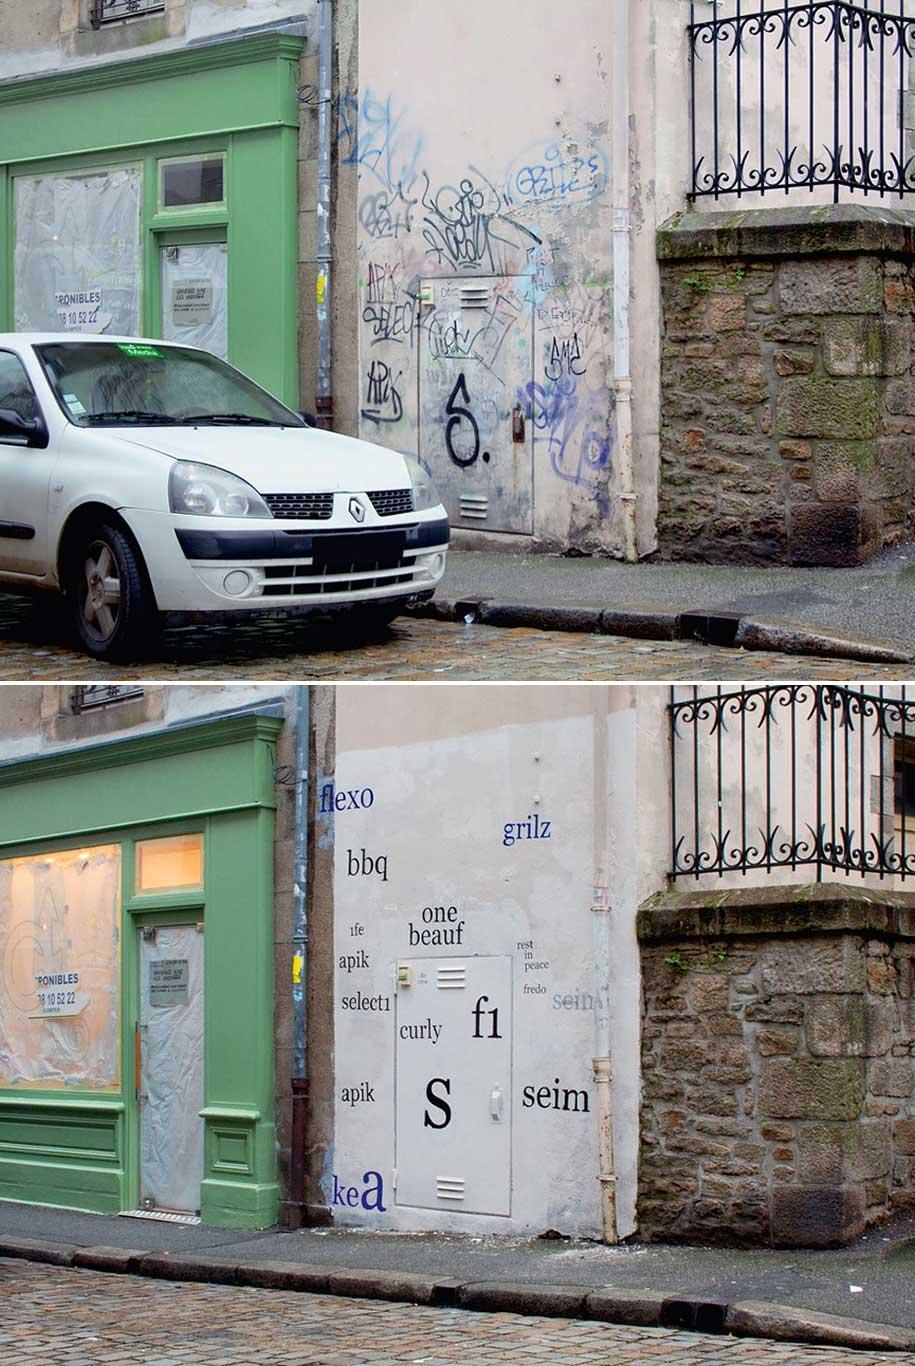 Mathieu Tremblin macht Graffiti-Tags leserlich Mathieu-Tremblin-tag-clouds-graffiti_03